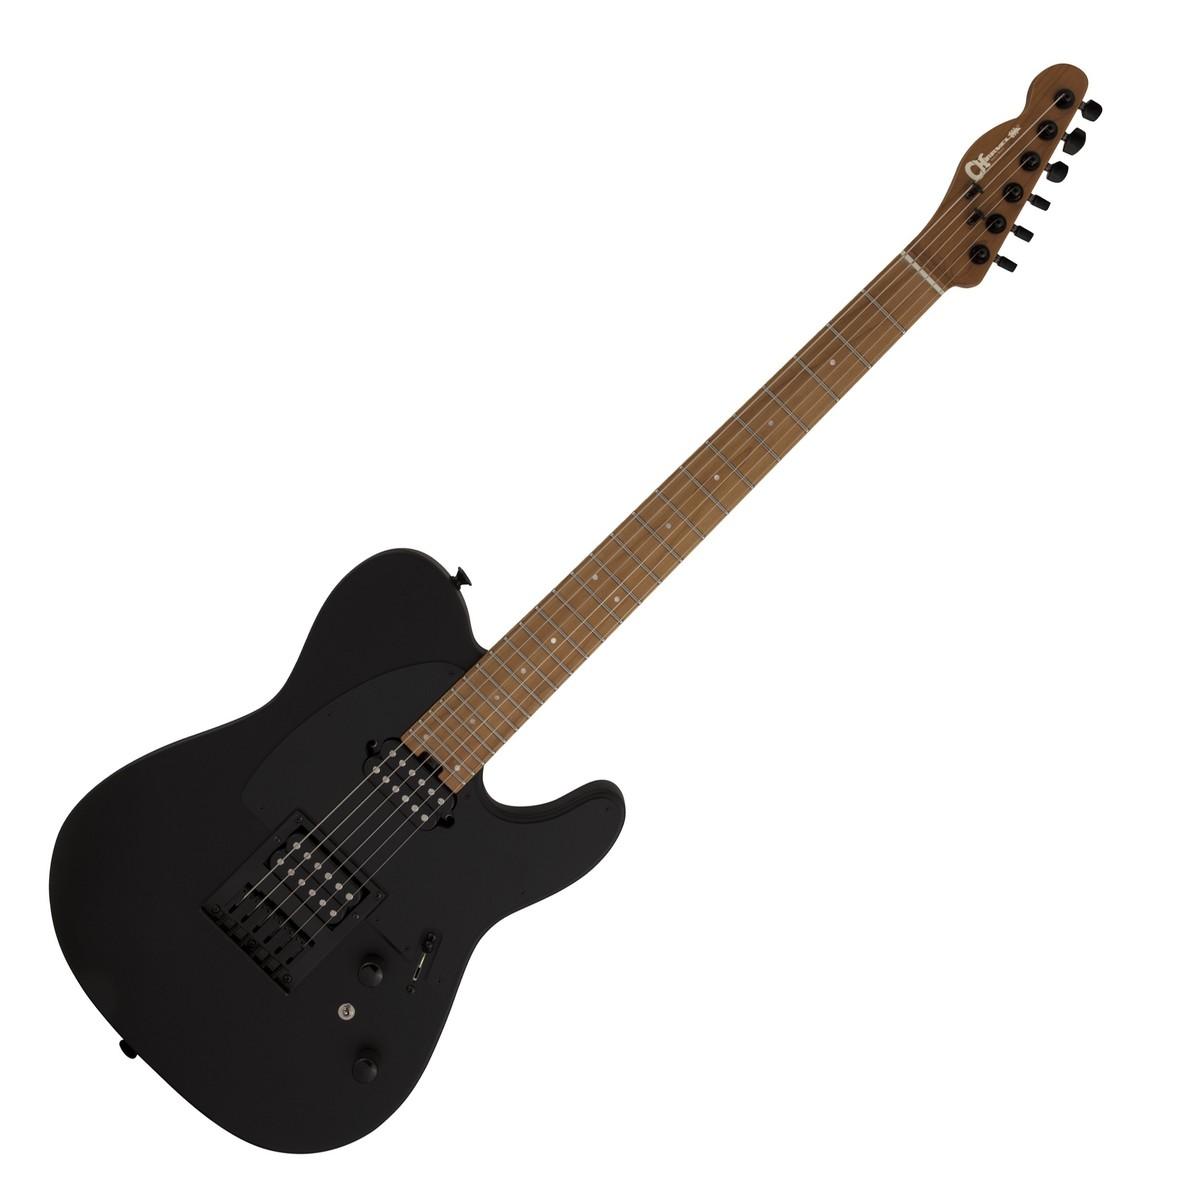 CHARVEL-Pro-Mod-So-Cal-Style-2-24-HH-HT-CM-Satin-Black-2966551568-sku-23934